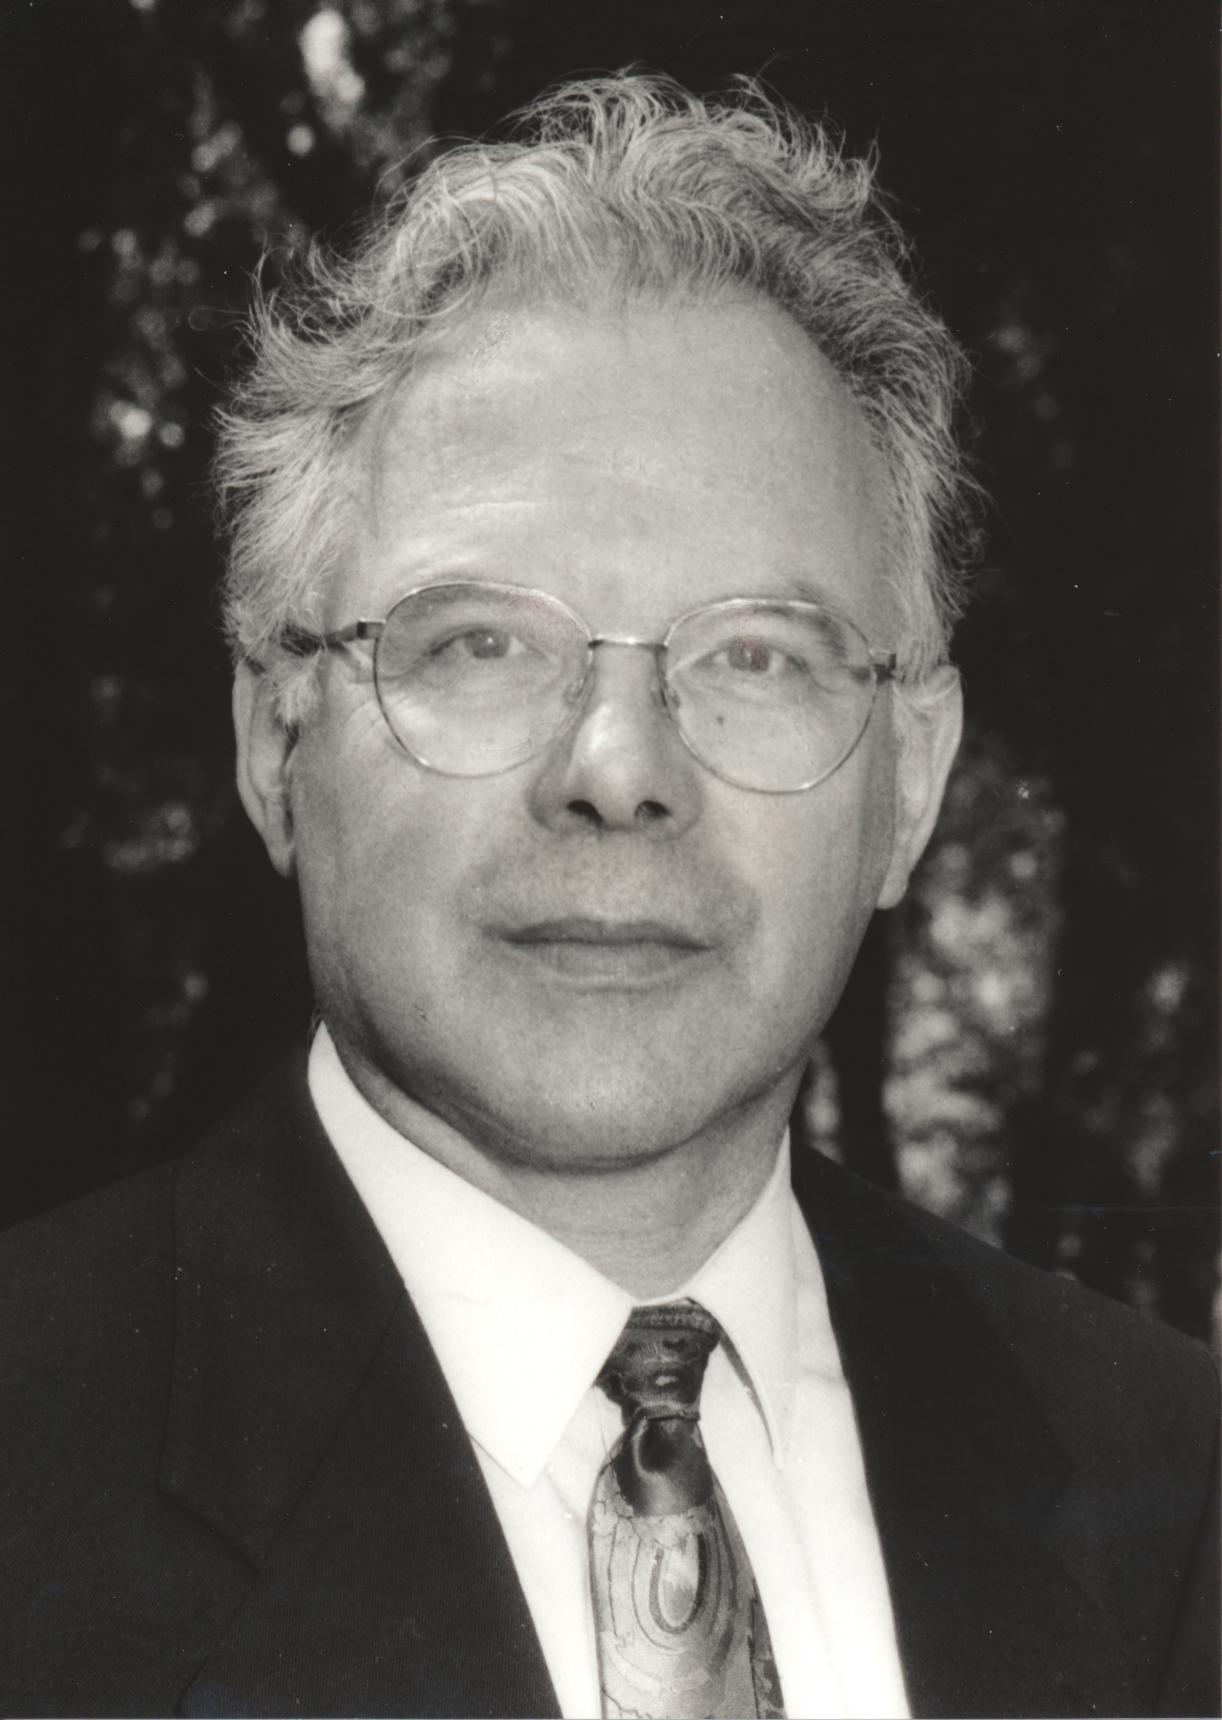 XIV. Imago Mundi-Kongress 1993, Innsbruck, Prof. DDr. Andreas Resch